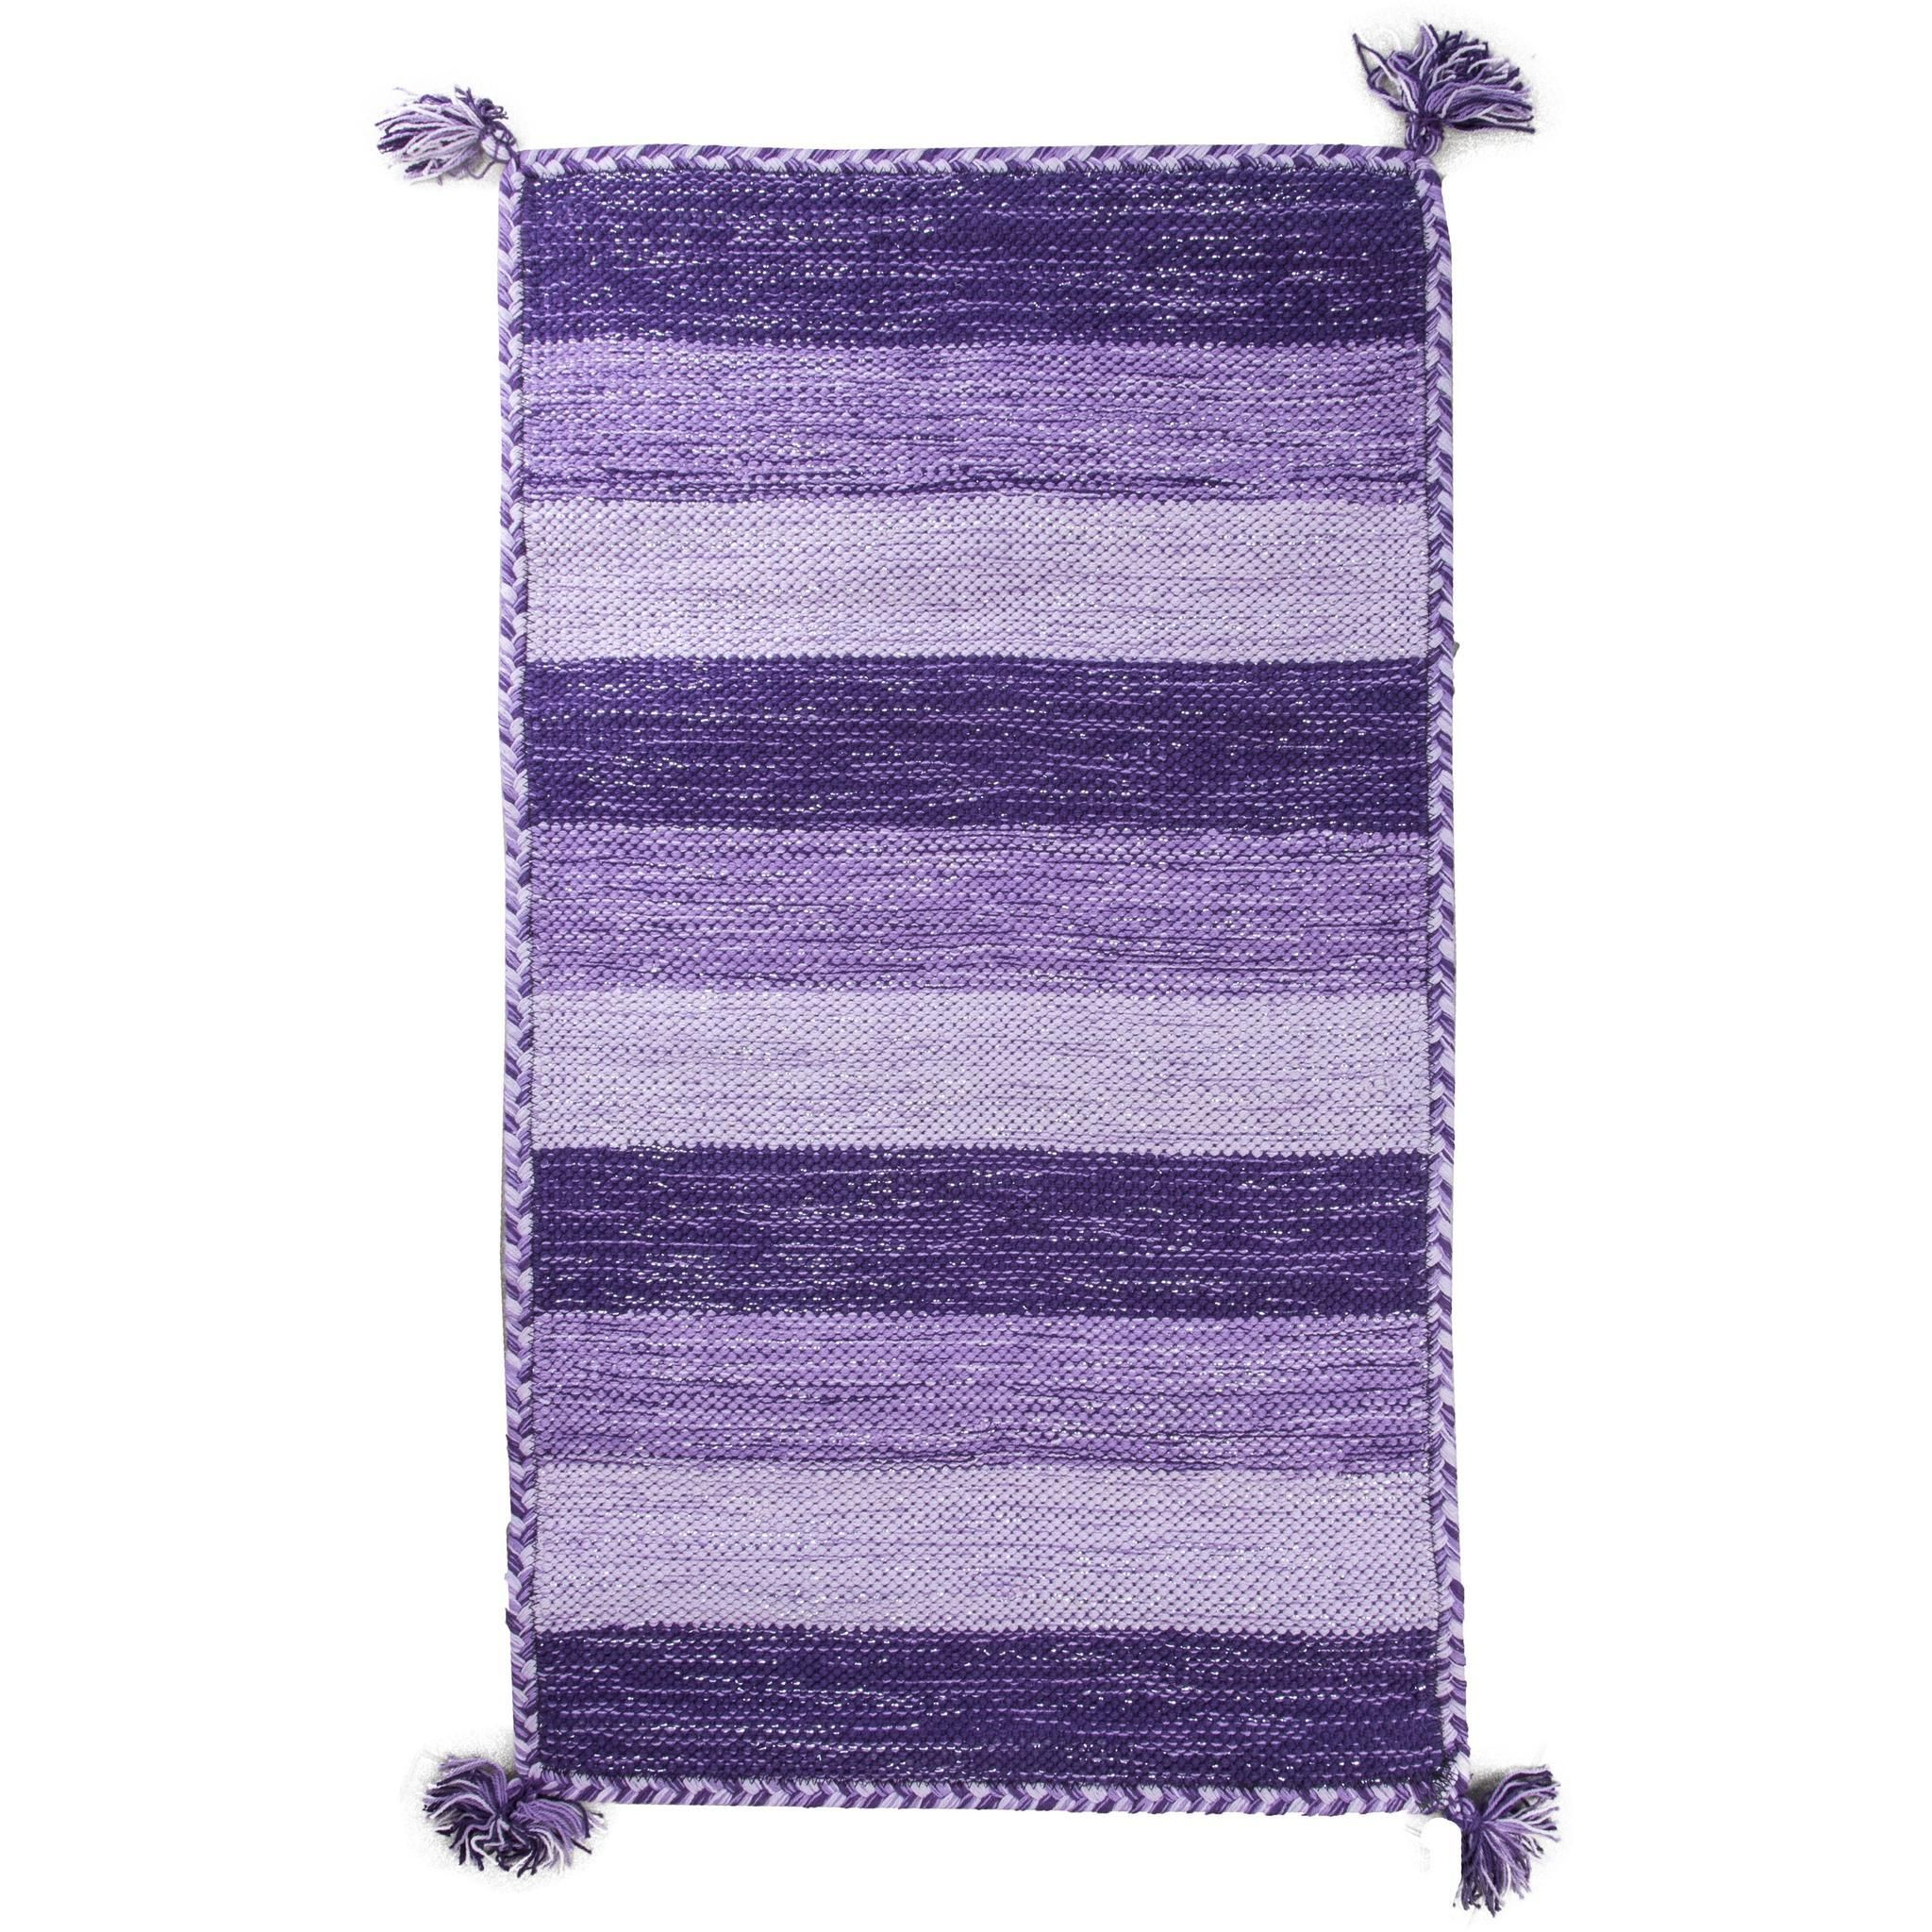 cp aladin absorbent 100% cotton bath rug, washable, bath mat, 39.4